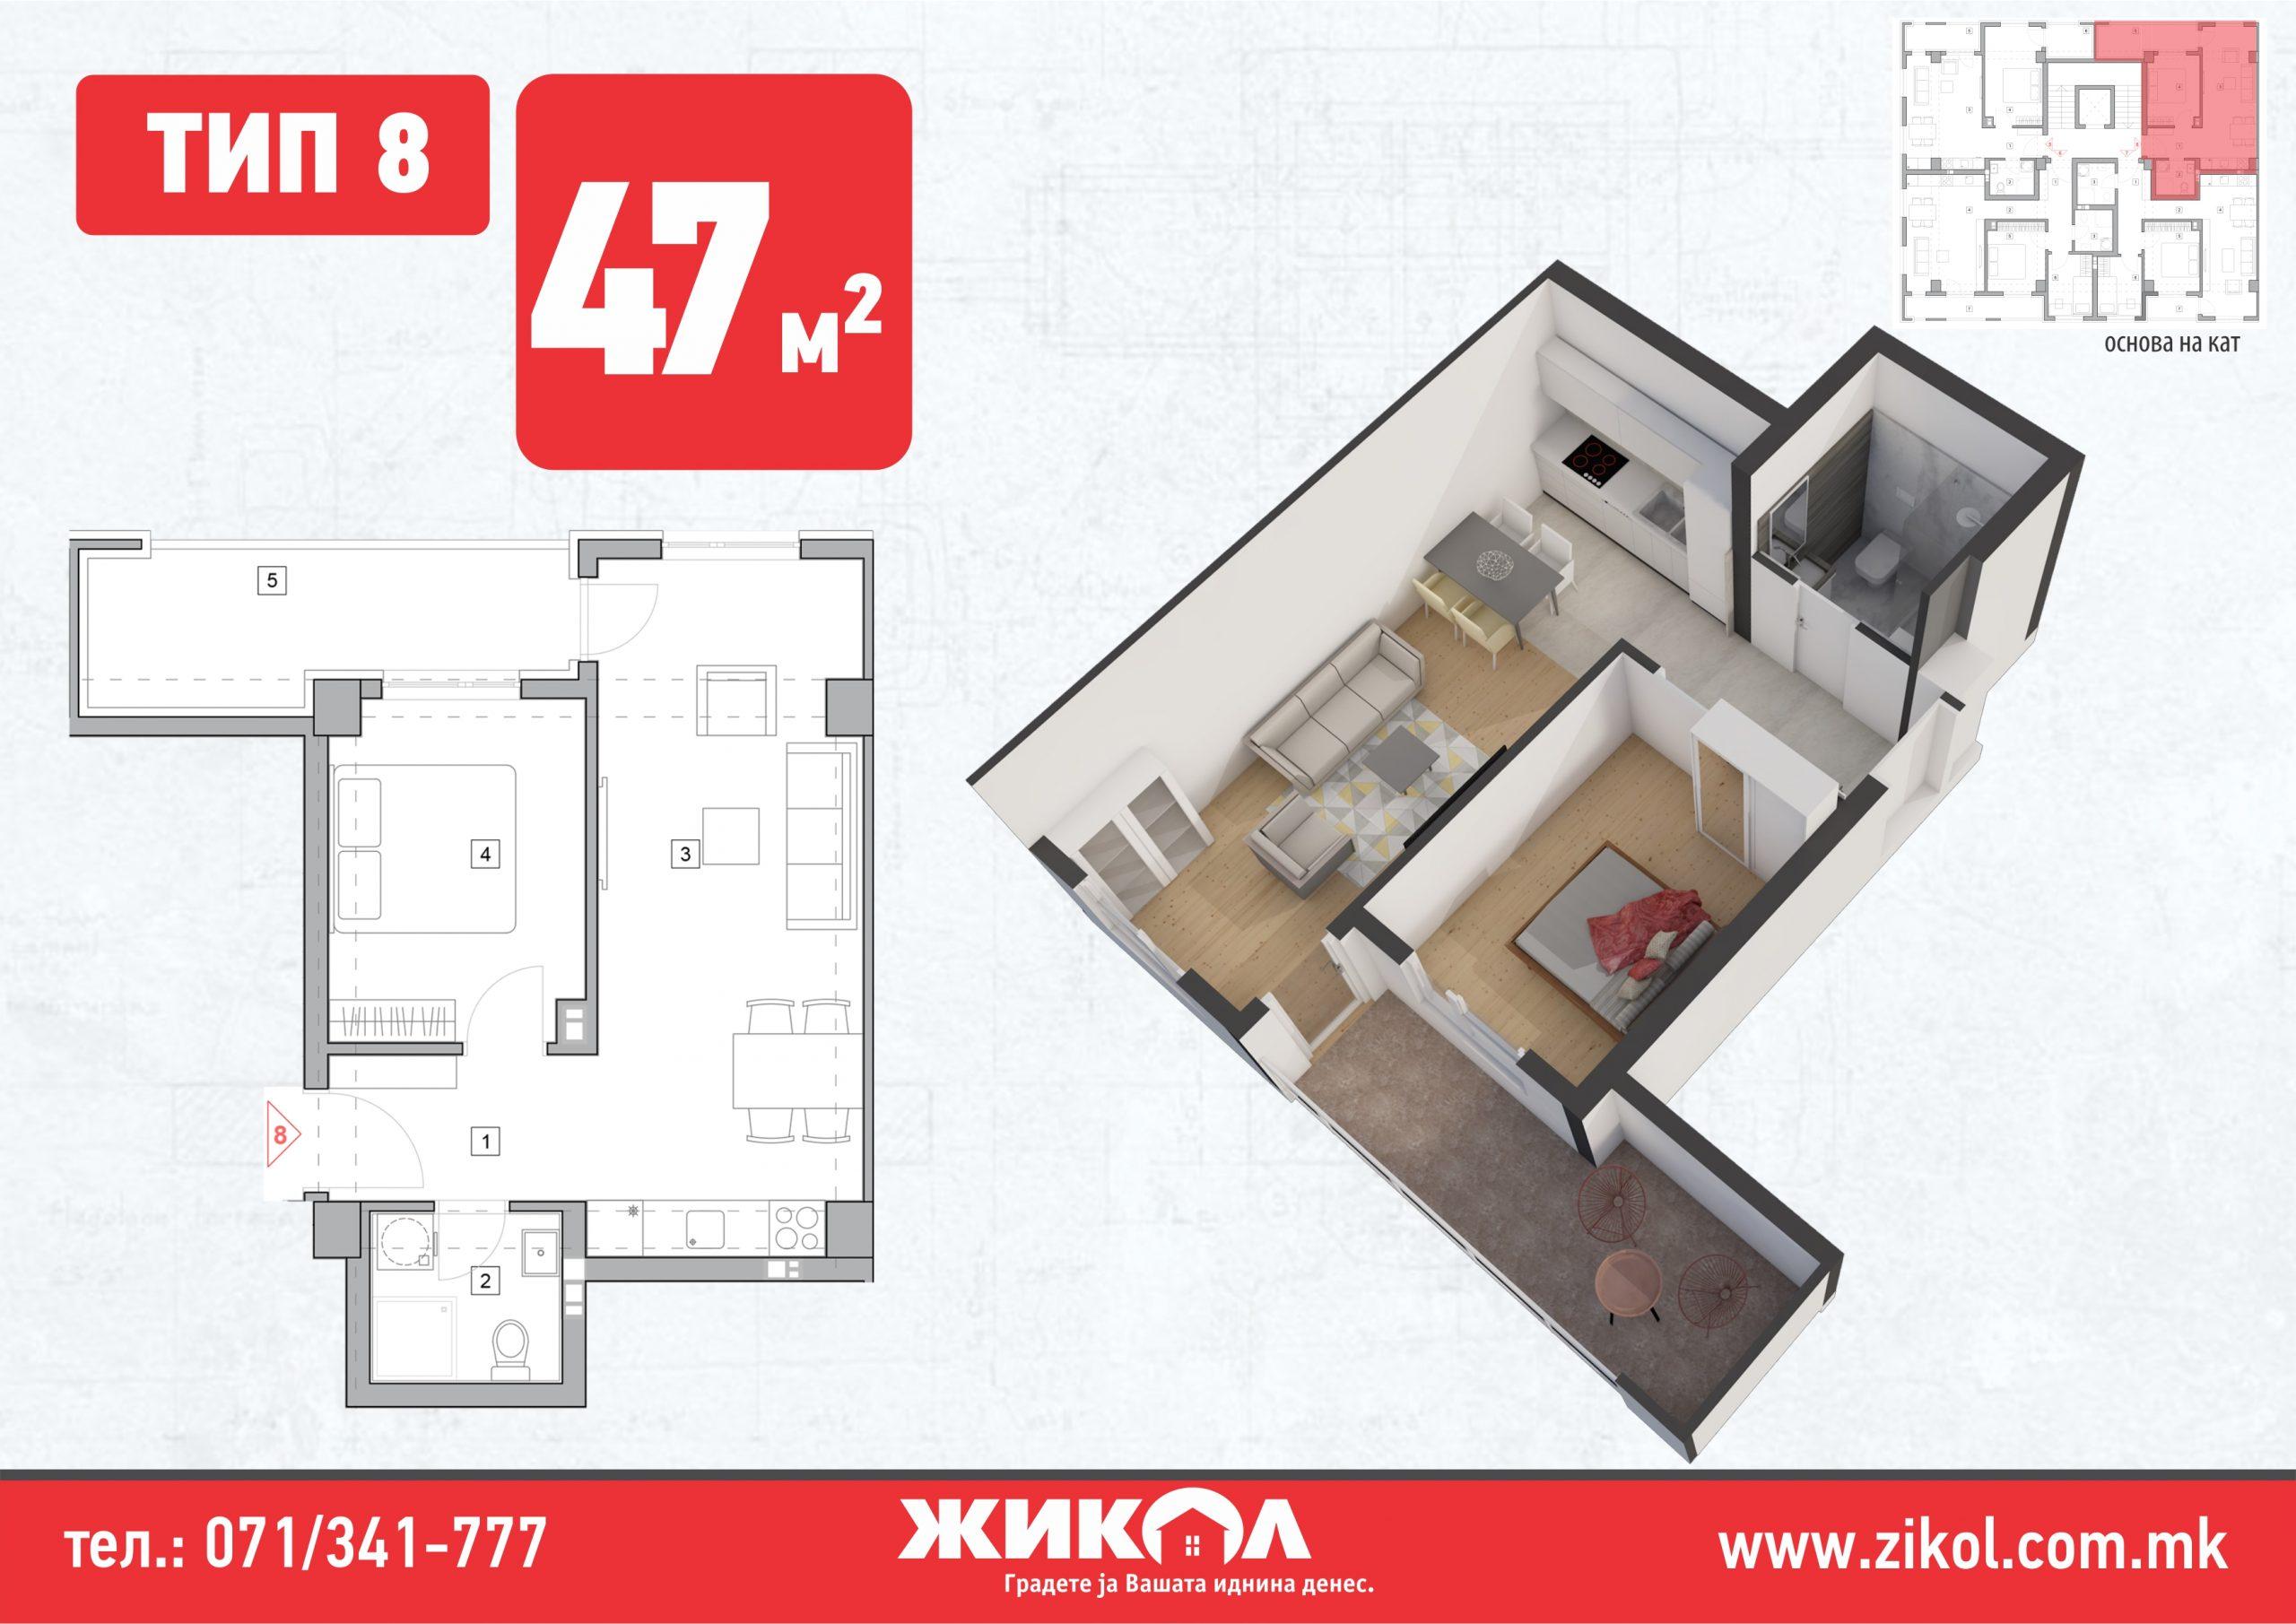 зграда 8, кат 1, стан 8